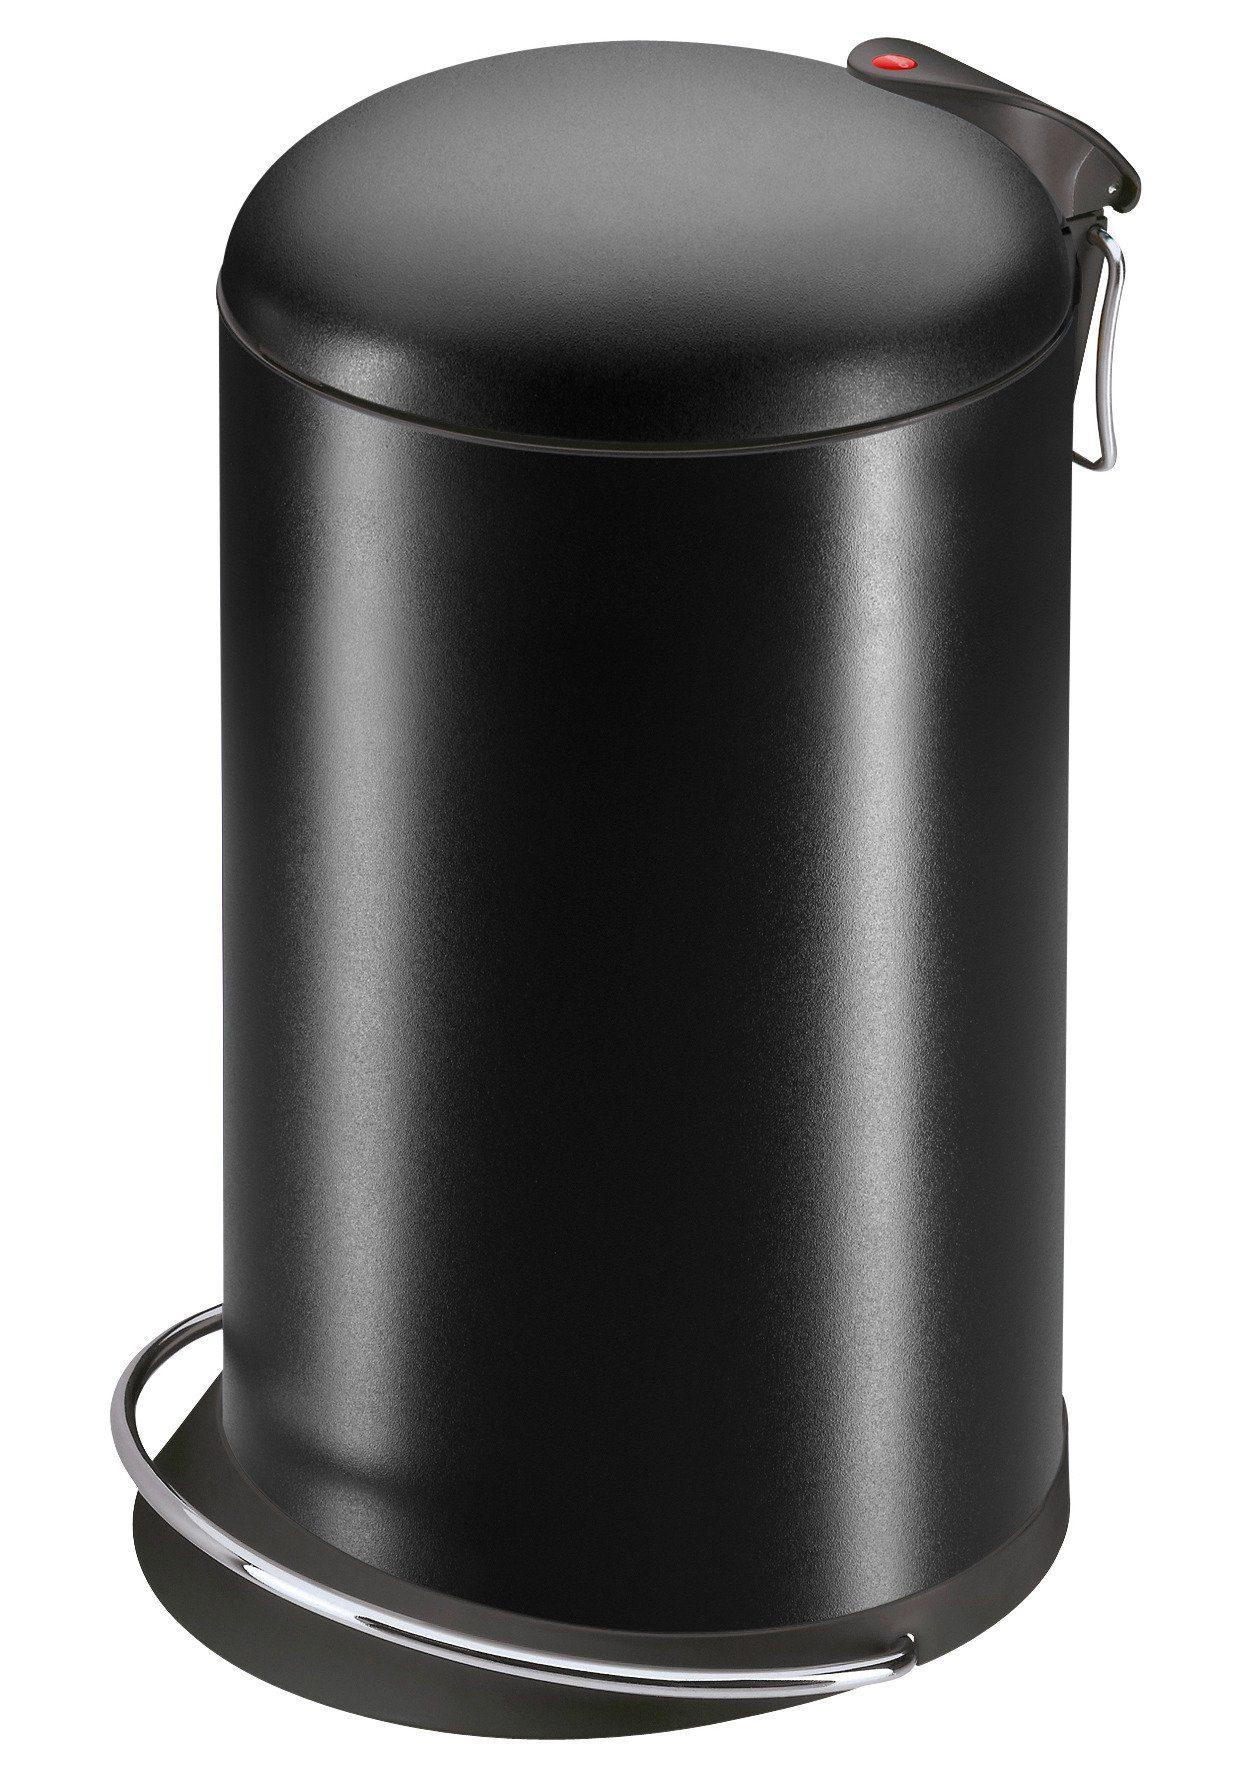 Tret-Abfallsammler »TopDesign 16«, schwarz